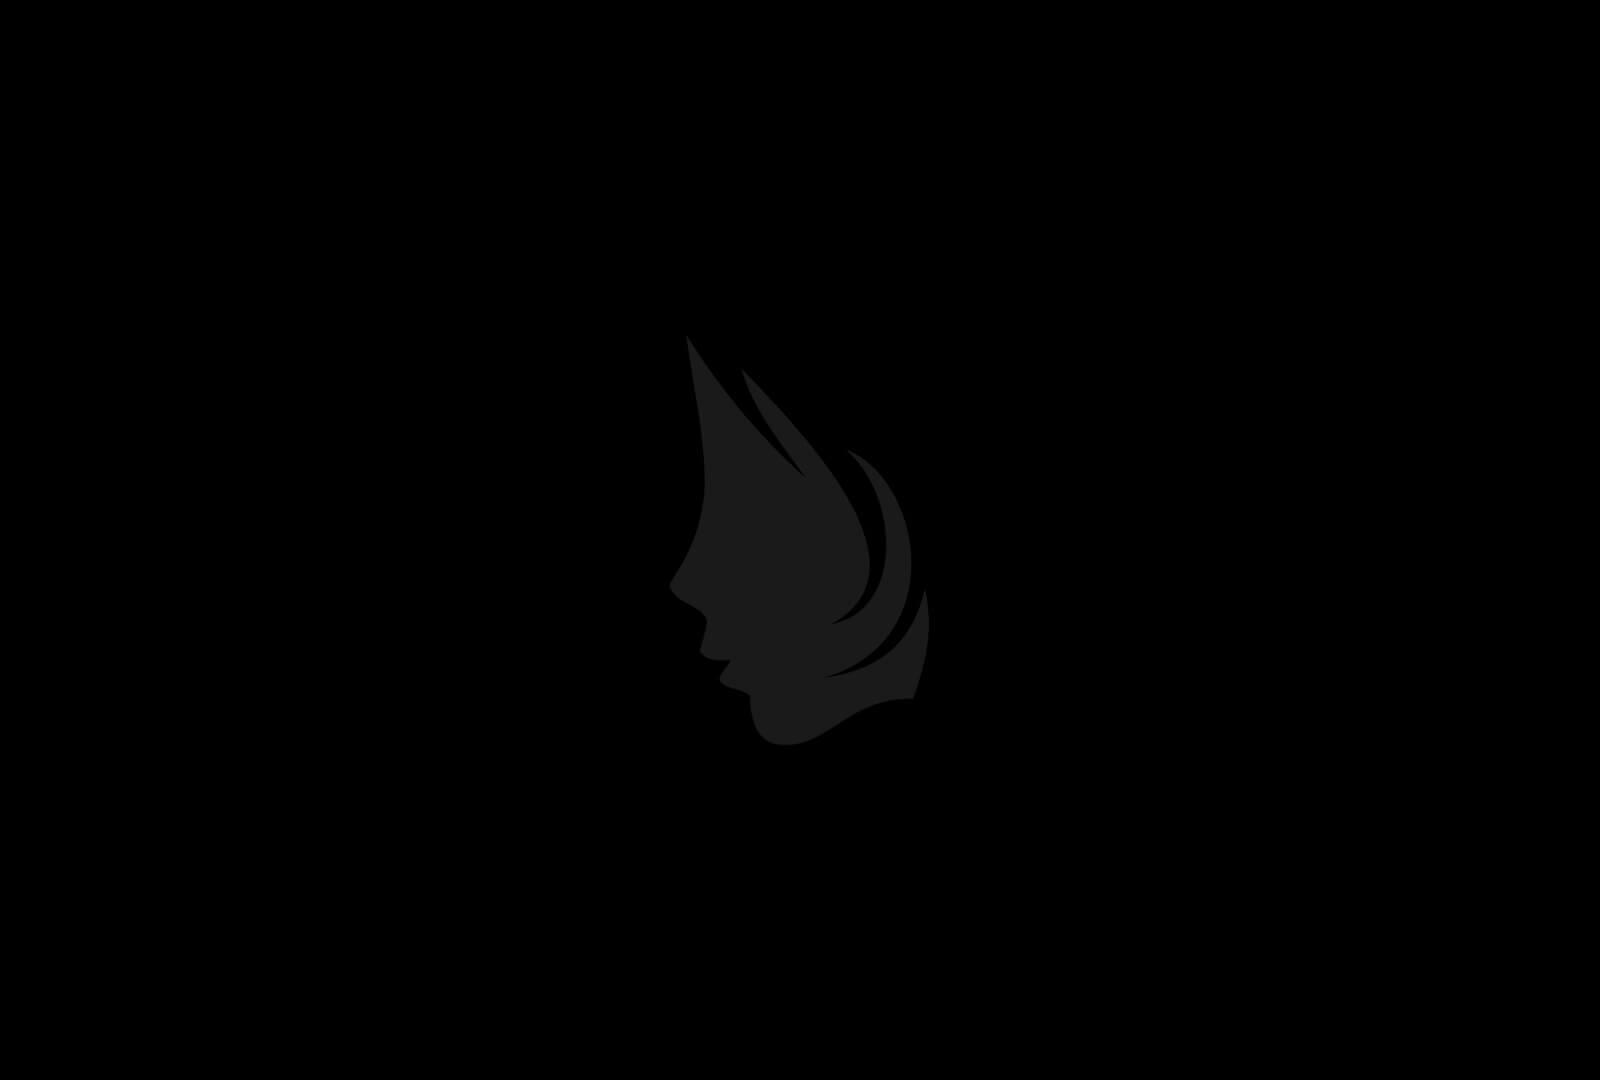 Nancyfx and owin application development